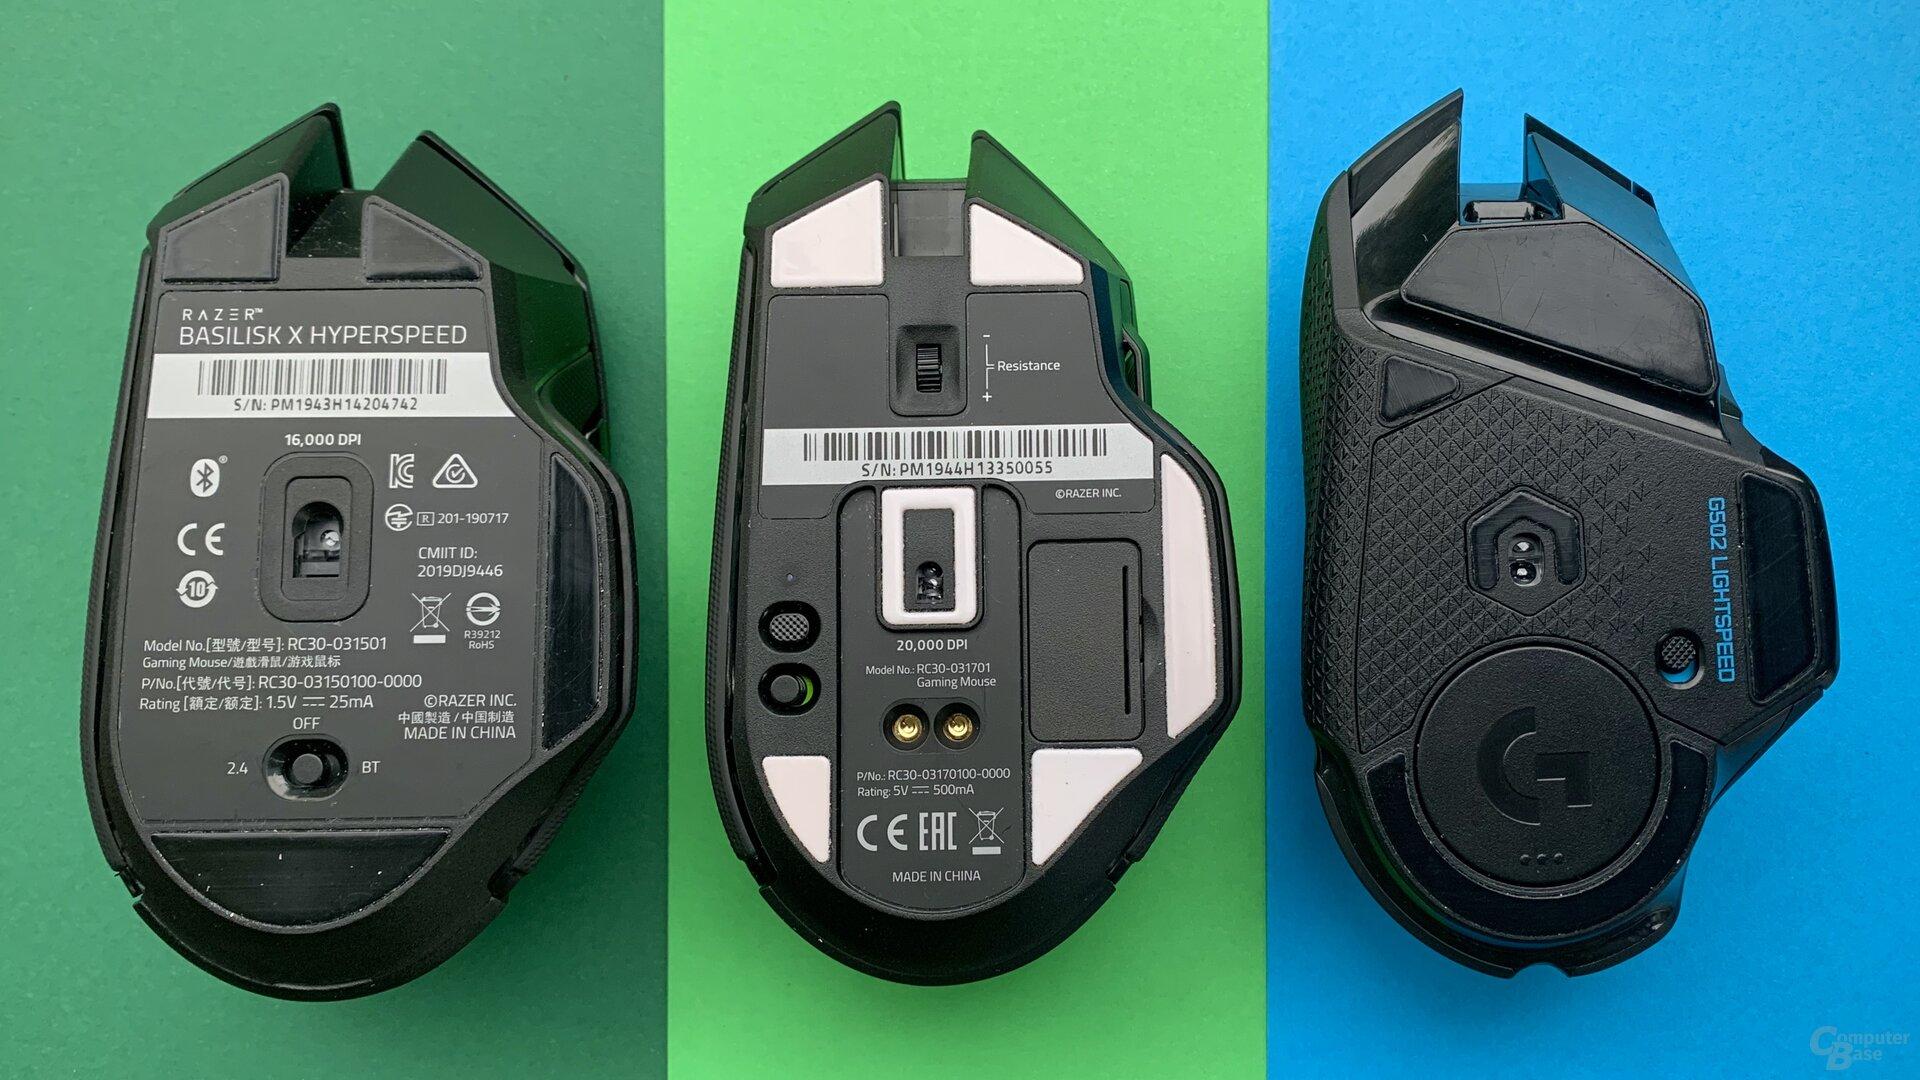 Razer Basilisk X HyperSpeed, Razer Basilisk Ultimate, Logitech G502 Lightspeed